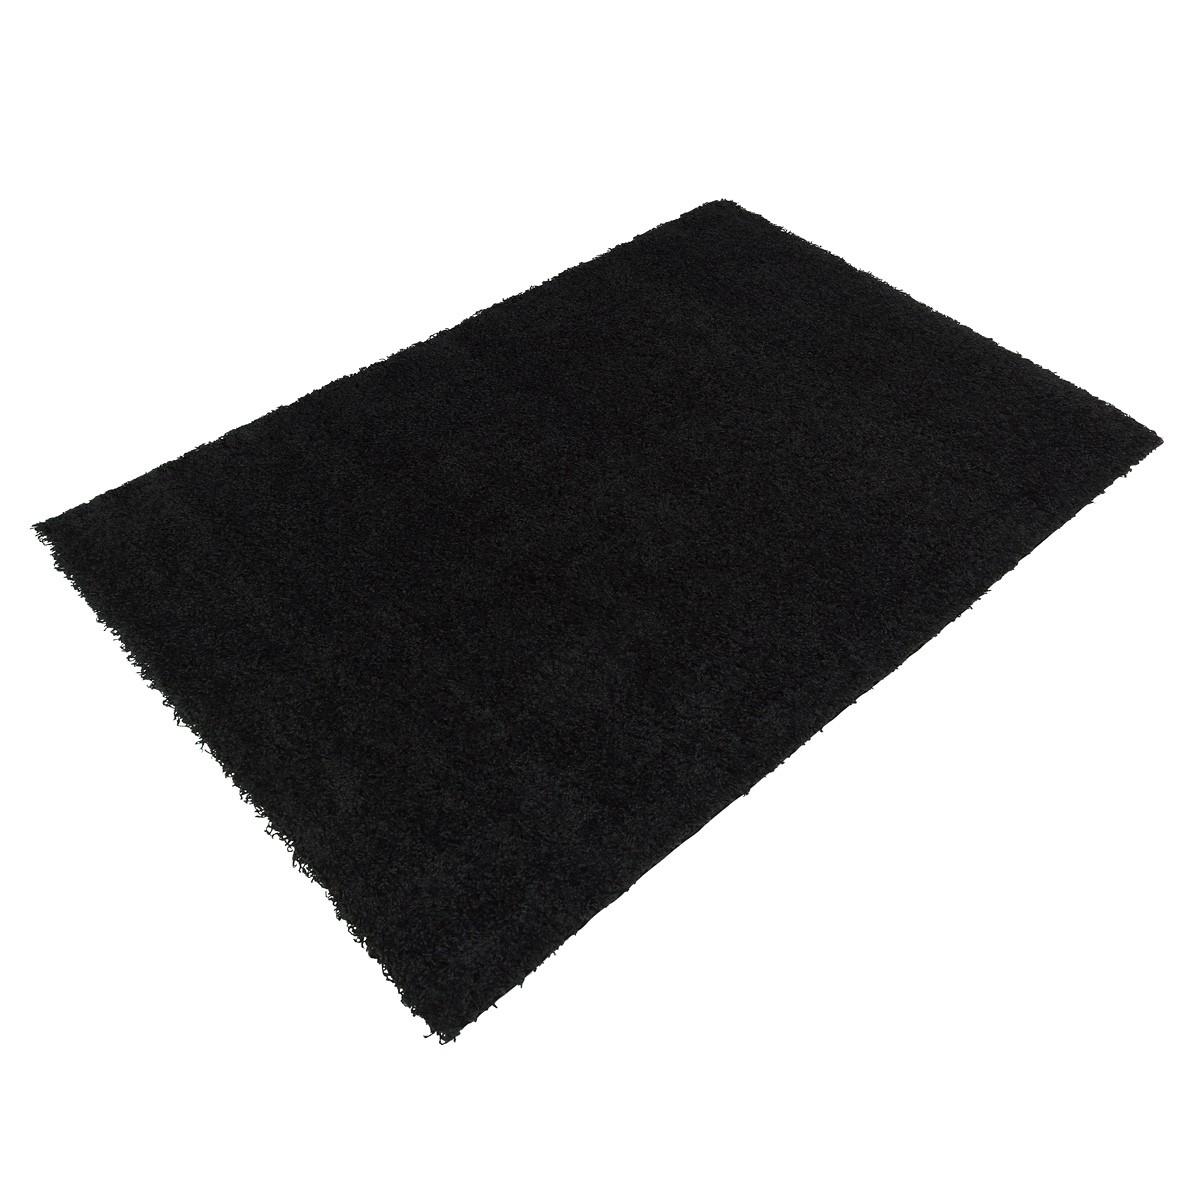 langflor teppich schwarz uni hochflor versch gr en. Black Bedroom Furniture Sets. Home Design Ideas